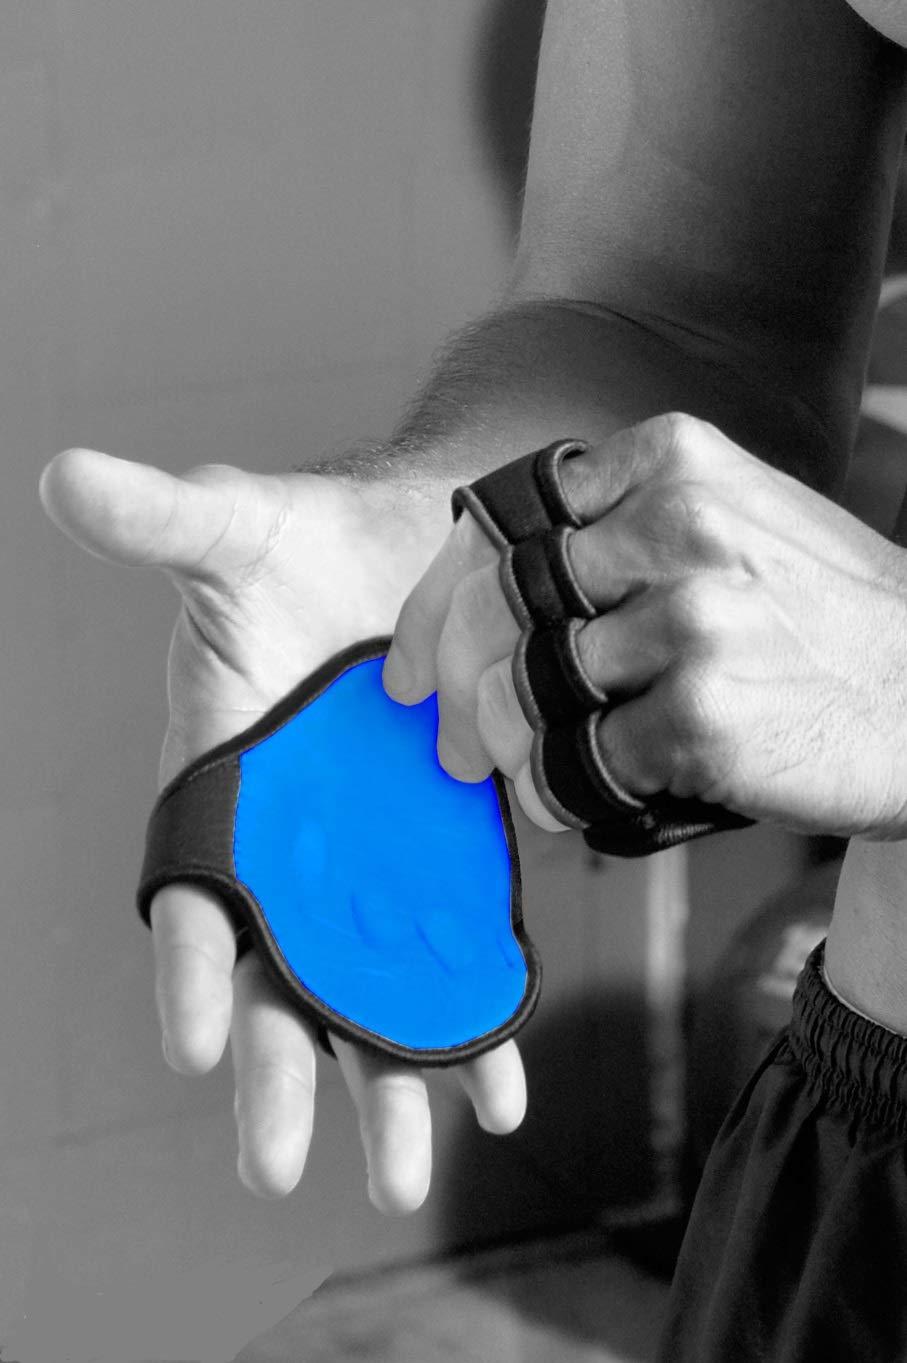 Fingerless Workout Gloves - The OG Alternative to Gym Gloves - Genuine Leather w 4 Finger Loop Sweat Proof Backing